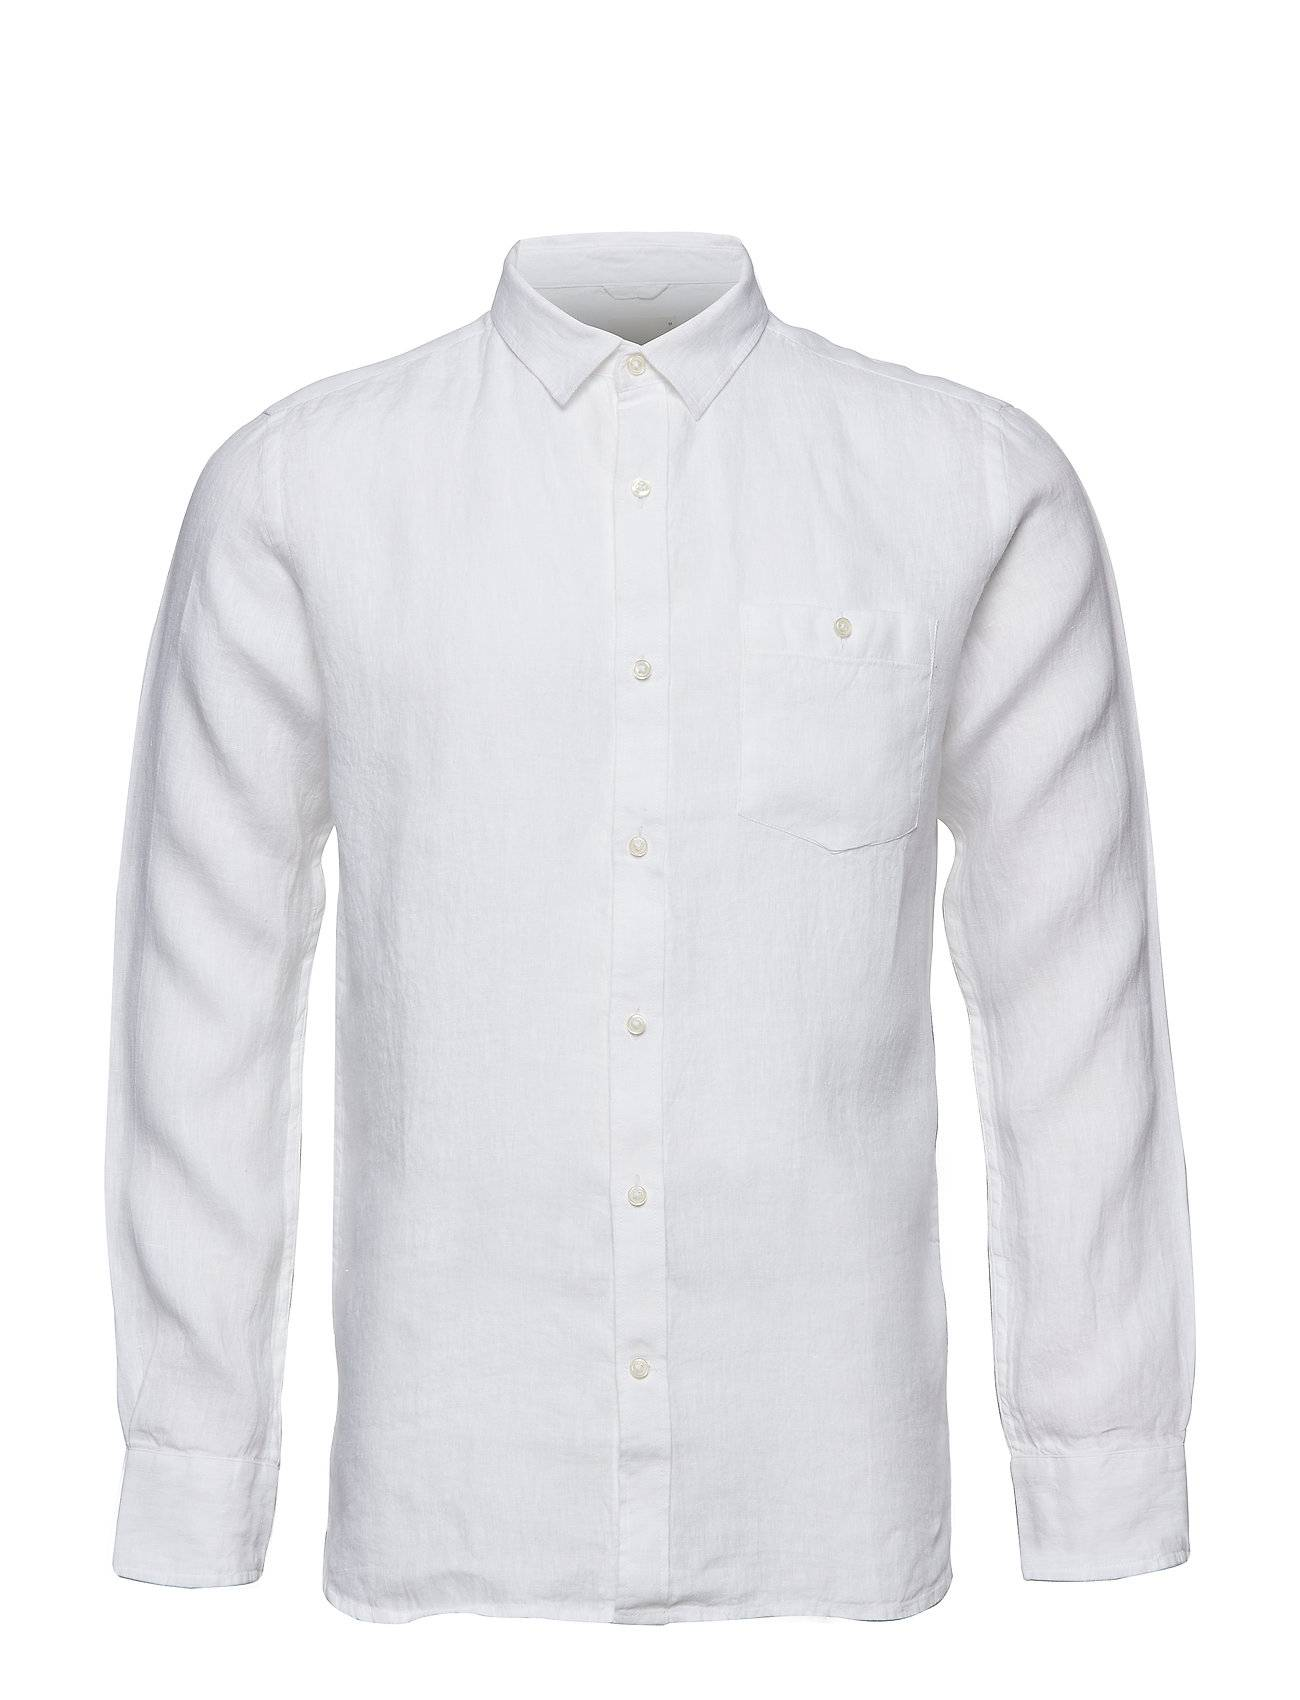 Knowledge Cotton Apparel Fabric Dyed Linen Shirt/Vegan